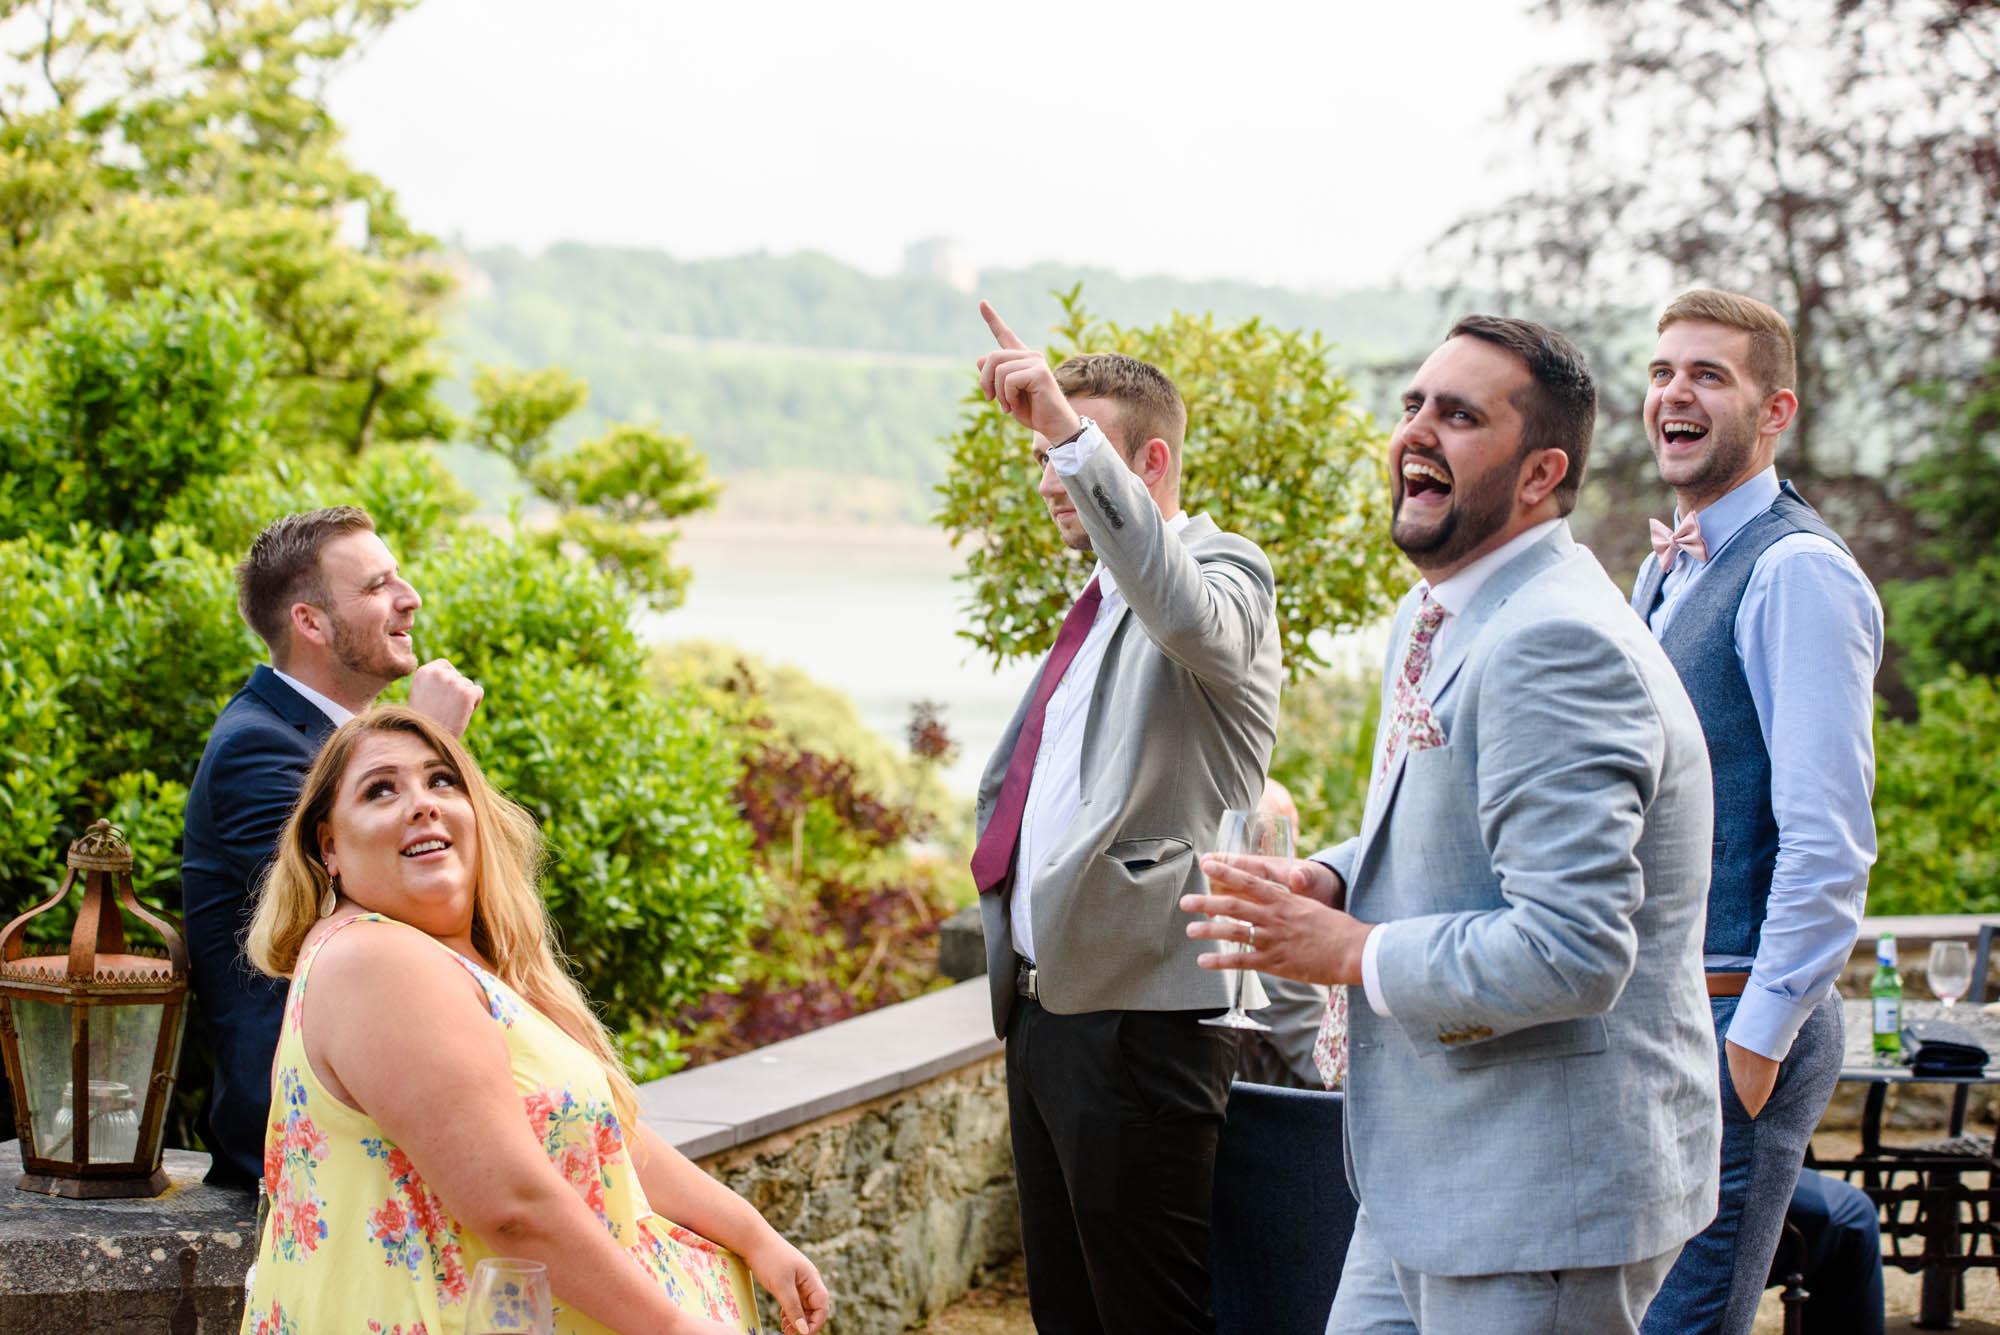 Guests teasing at Chateau Rhianfa